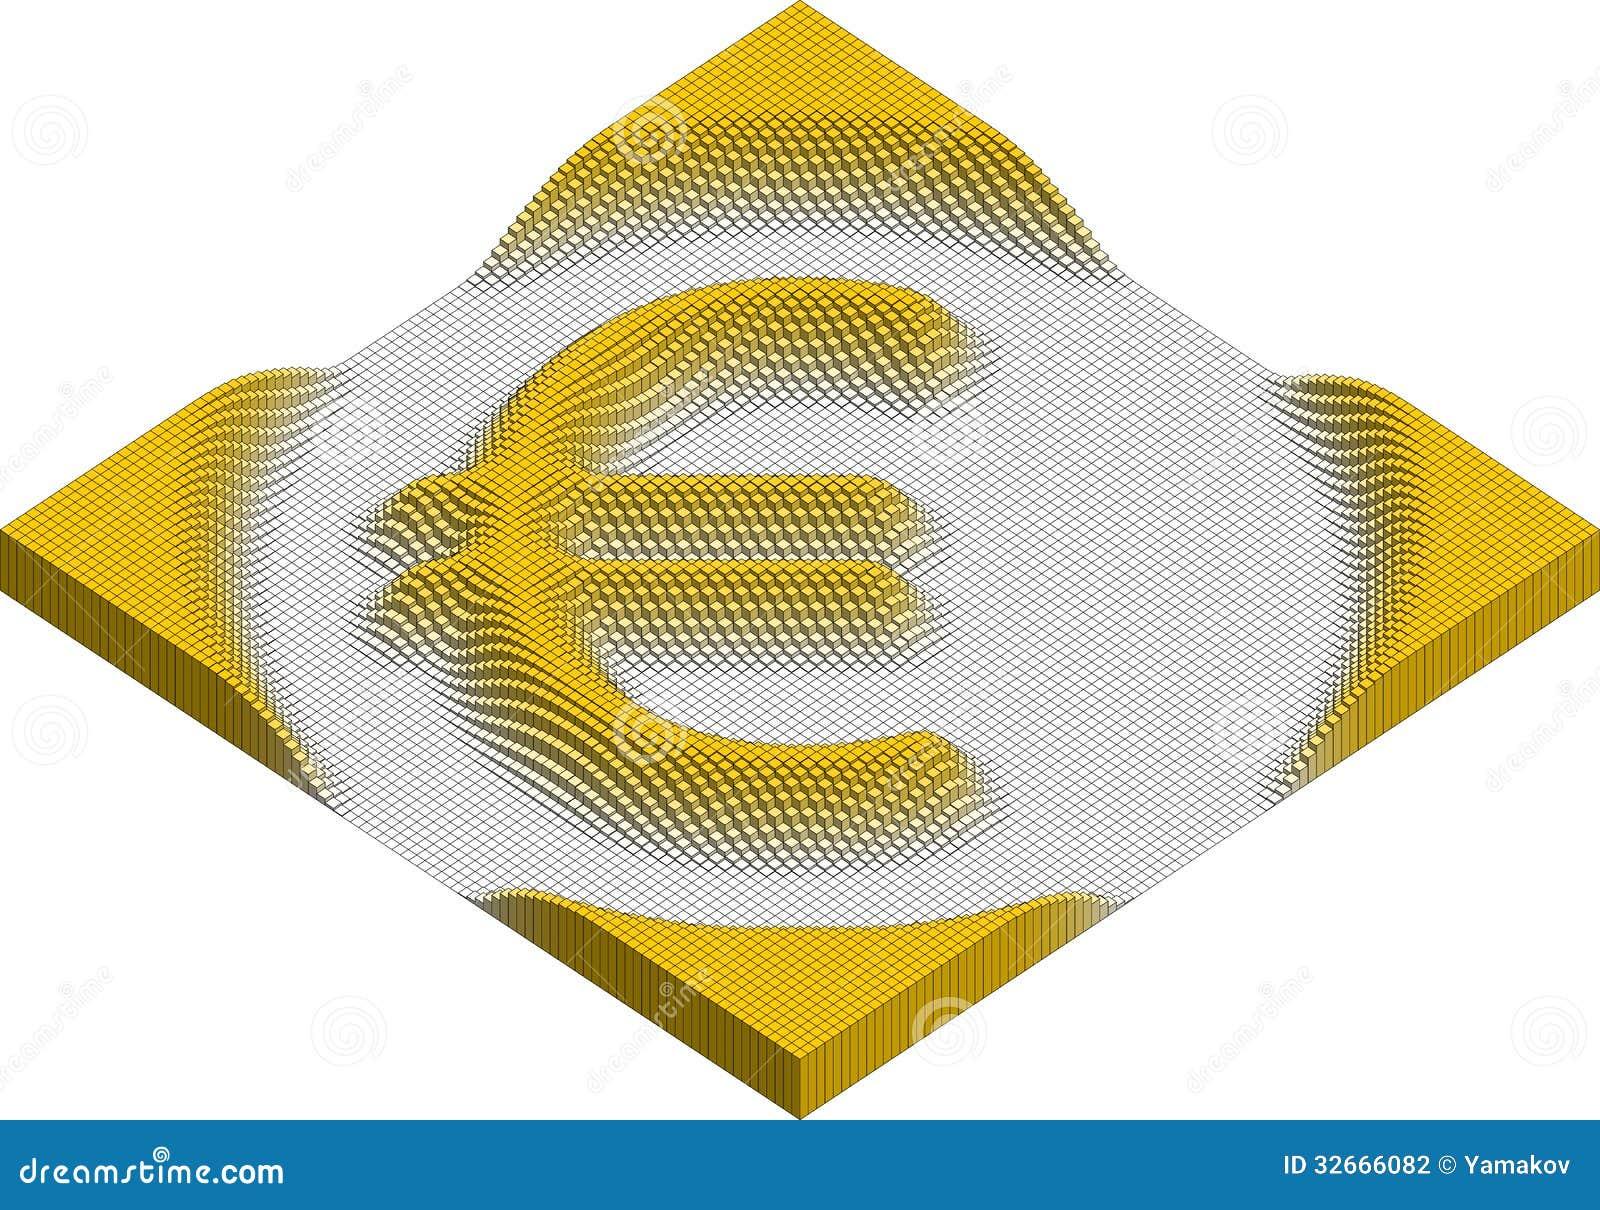 Euro currency symbol made of cubes stock vector illustration of euro currency symbol made of cubes buycottarizona Choice Image